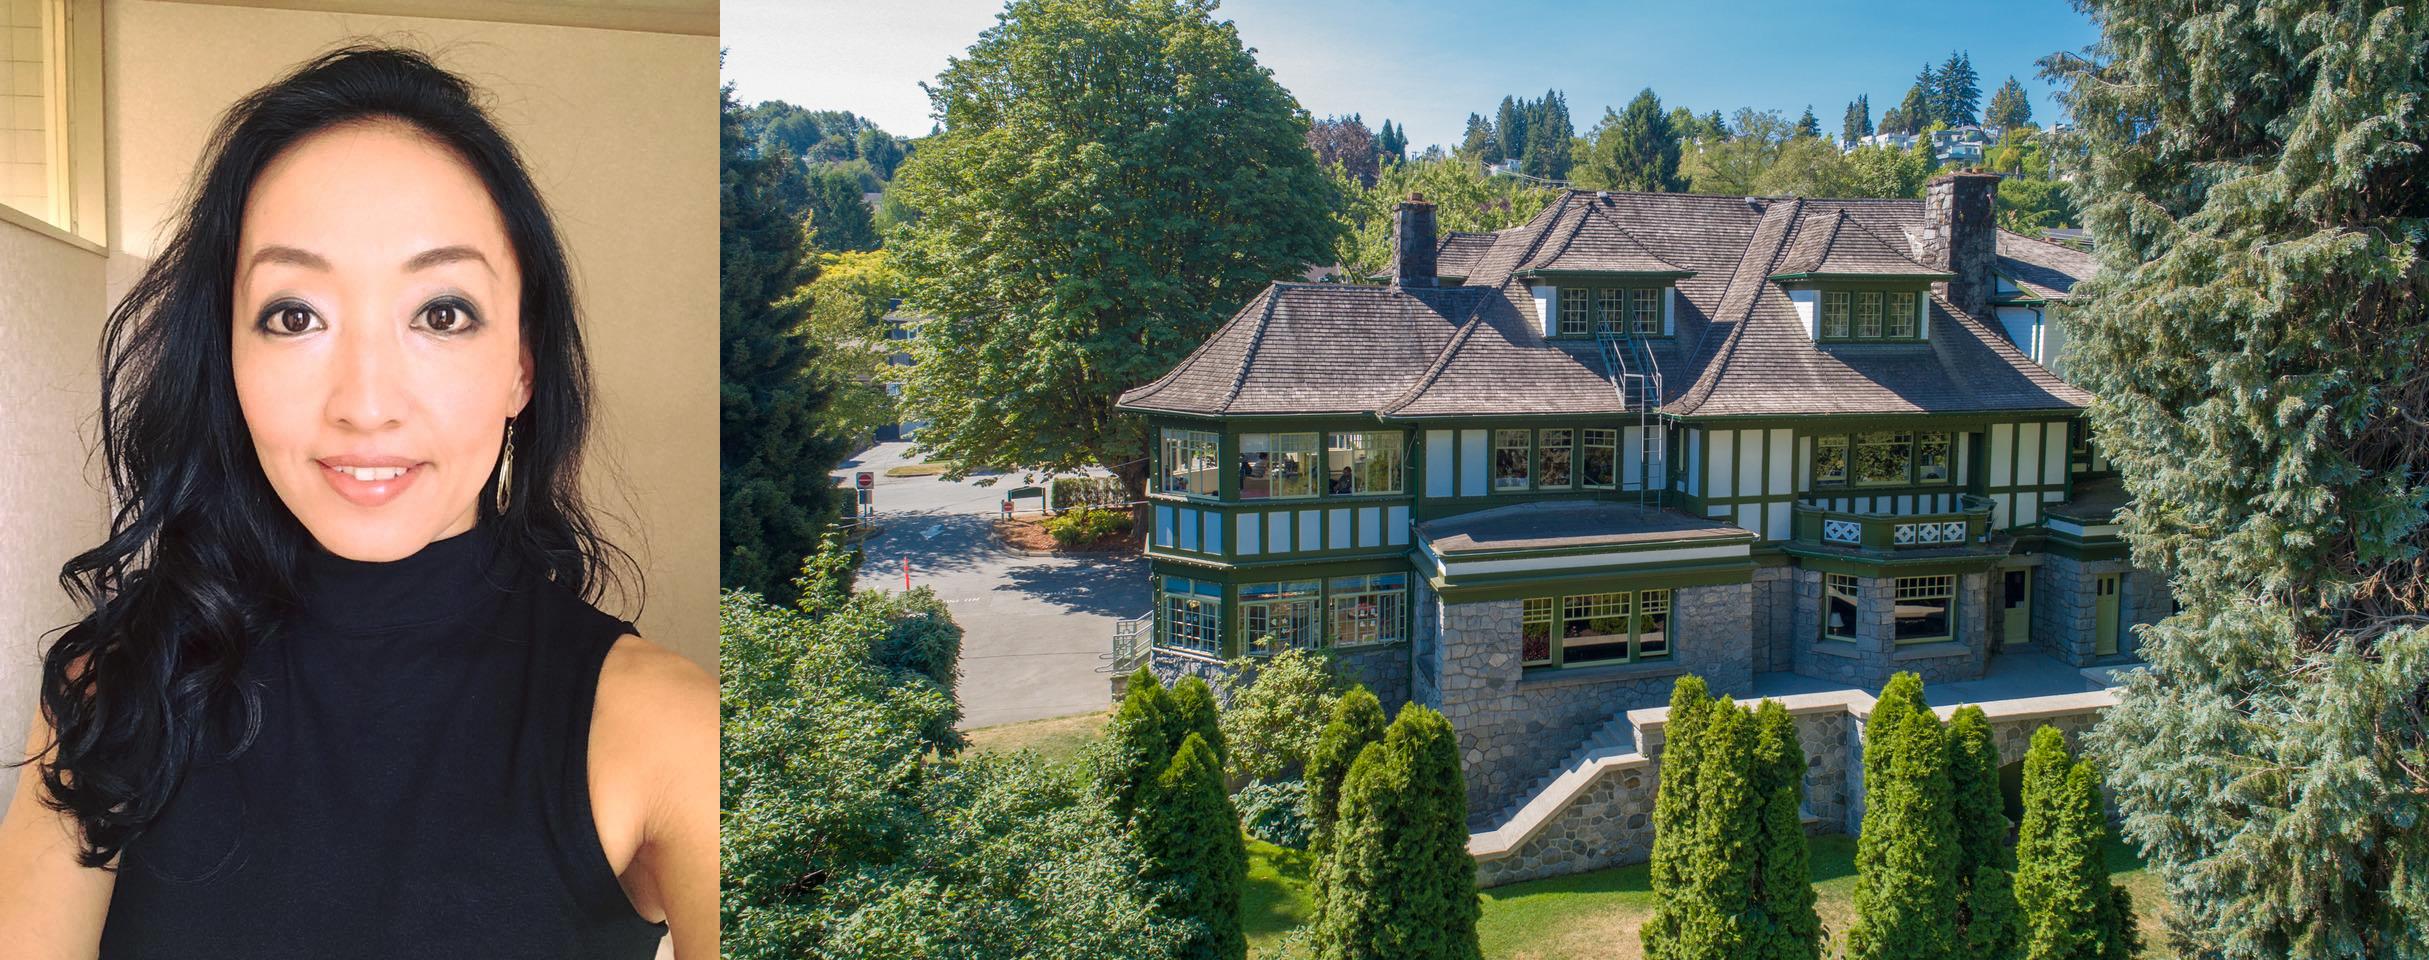 Ai Nakano and West Point Grey CC's Aberthau mansion